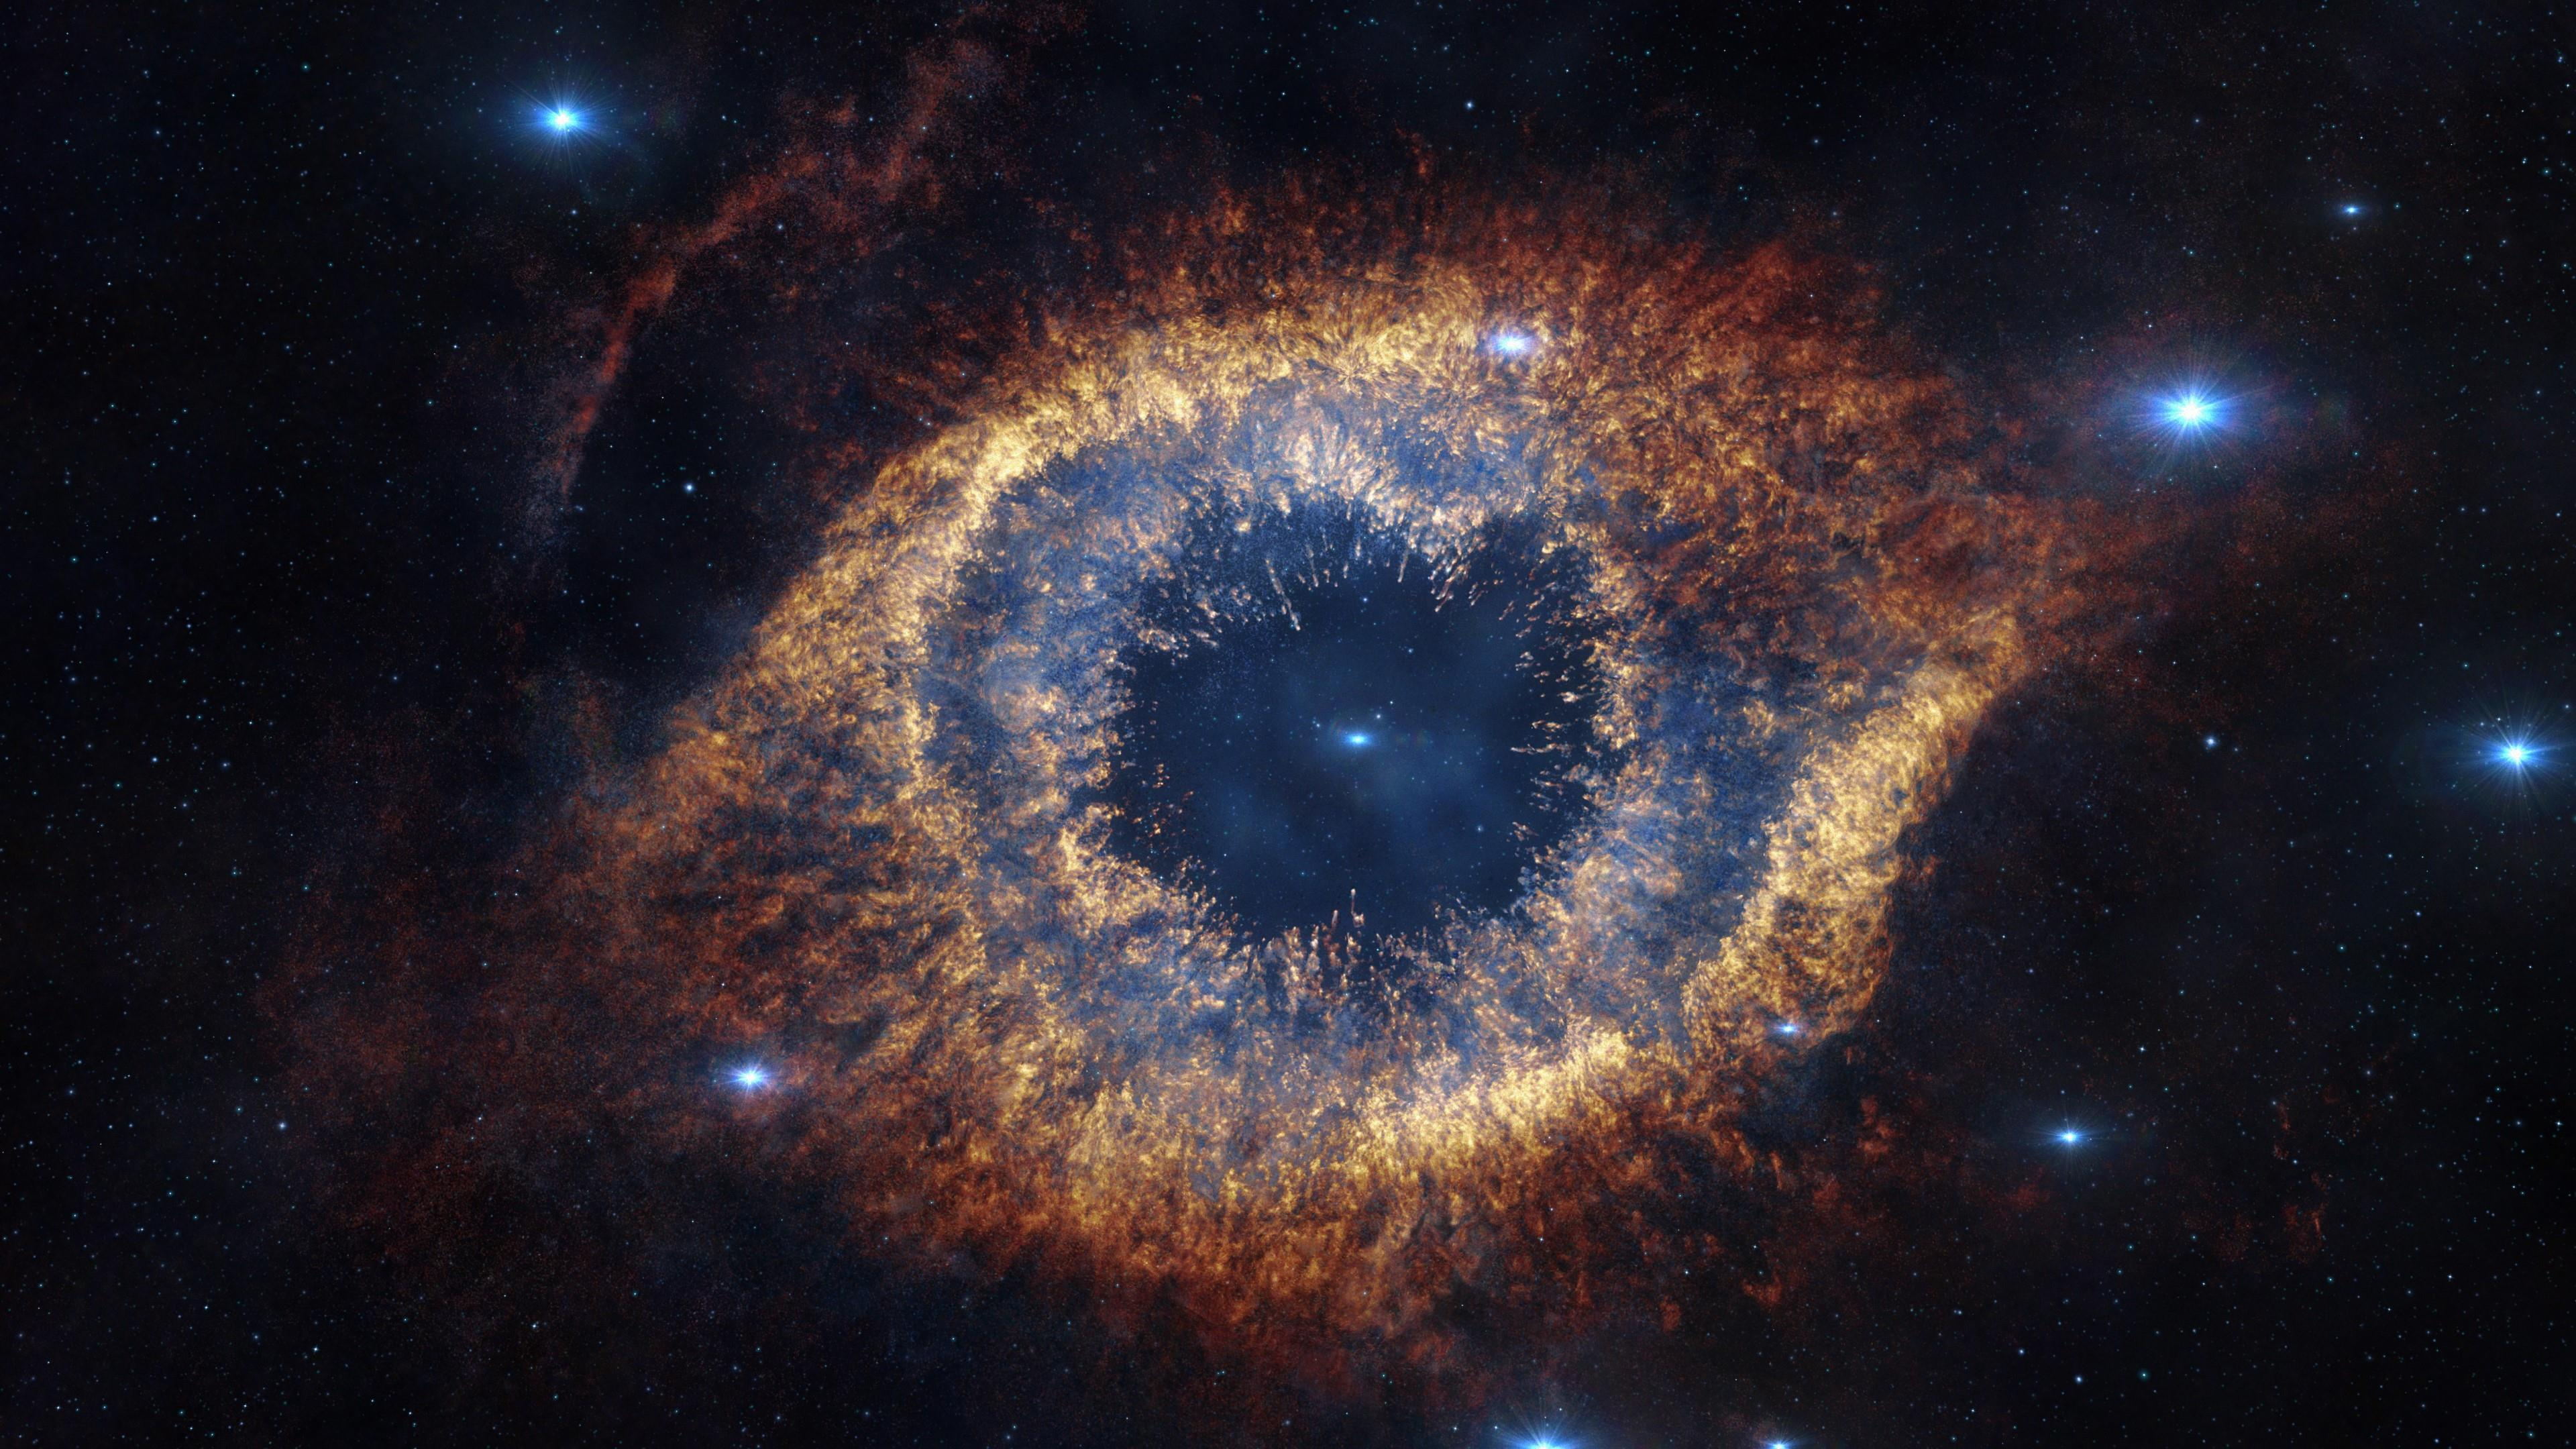 God S Eye Nebula Wallpapers Top Free God S Eye Nebula